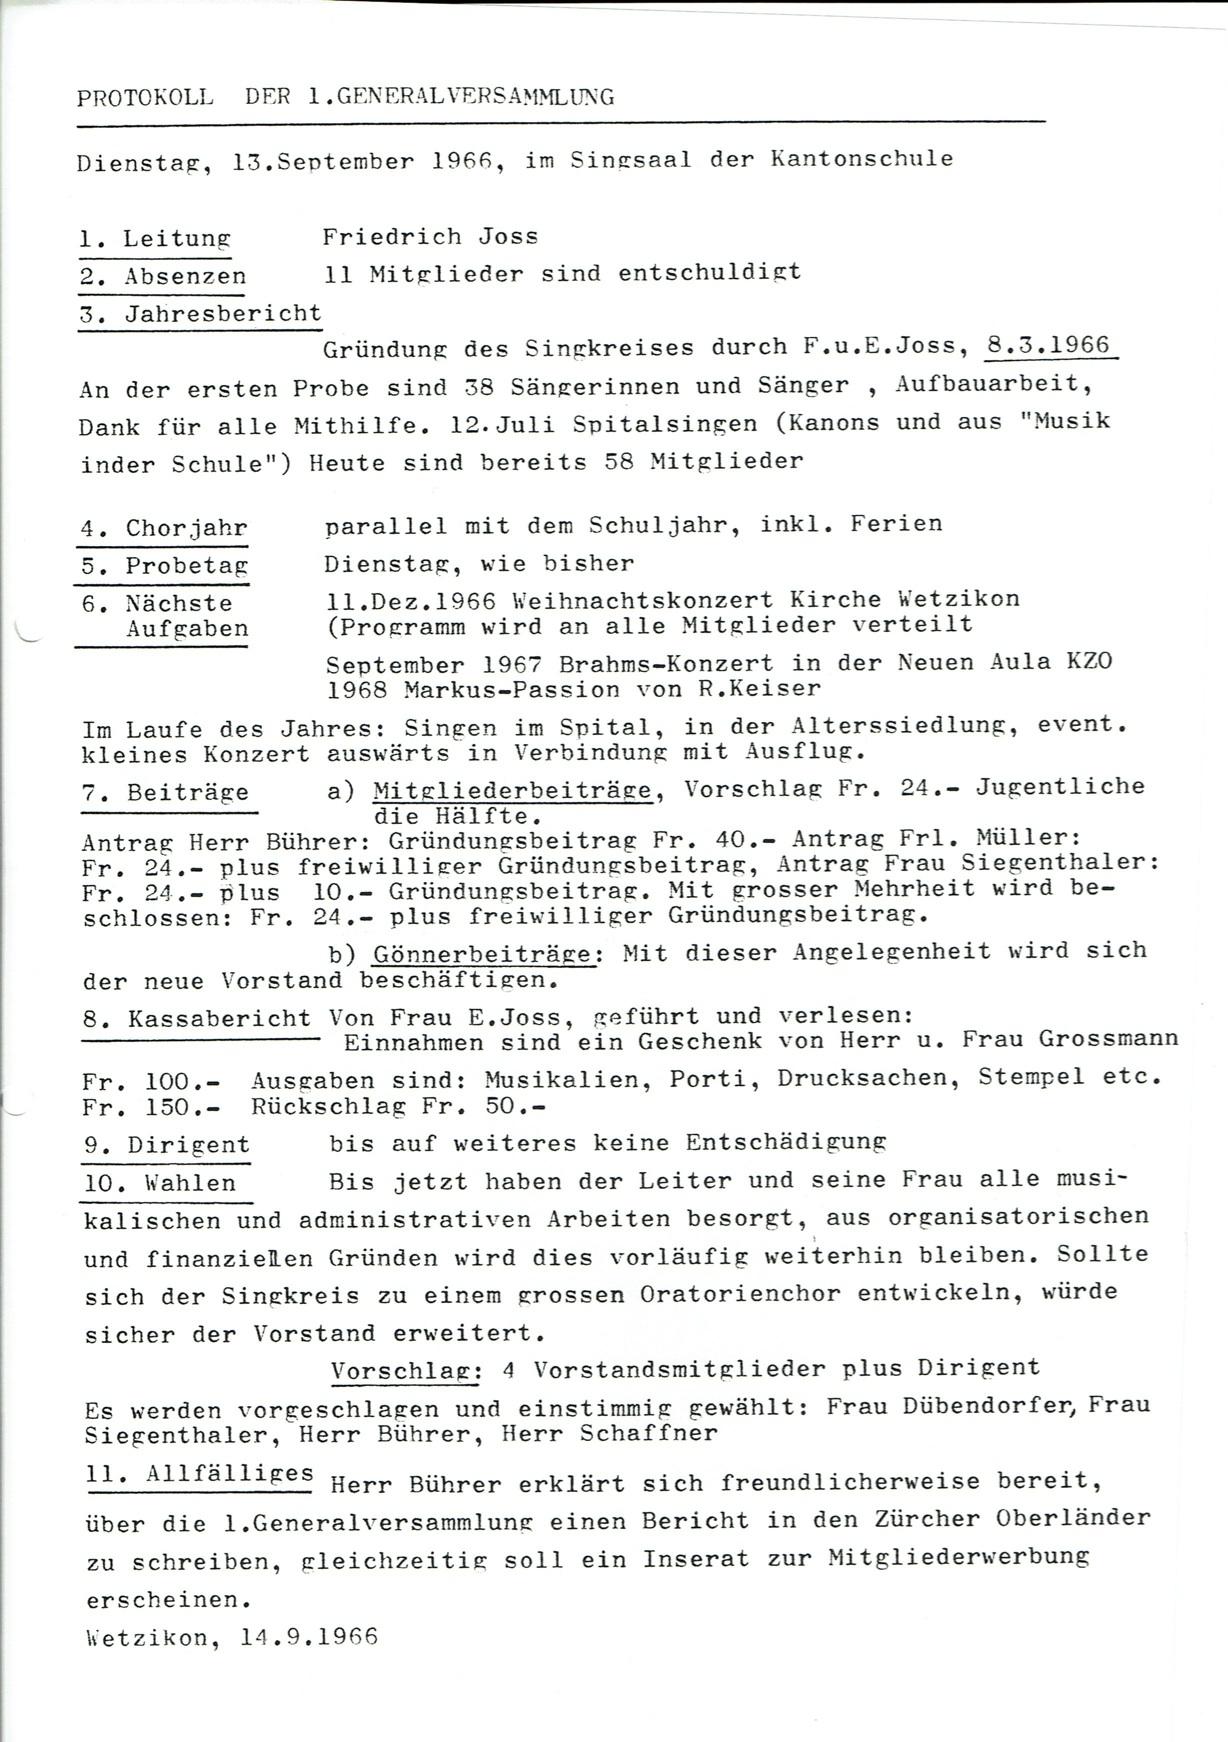 Protokoll 1.GV 1966